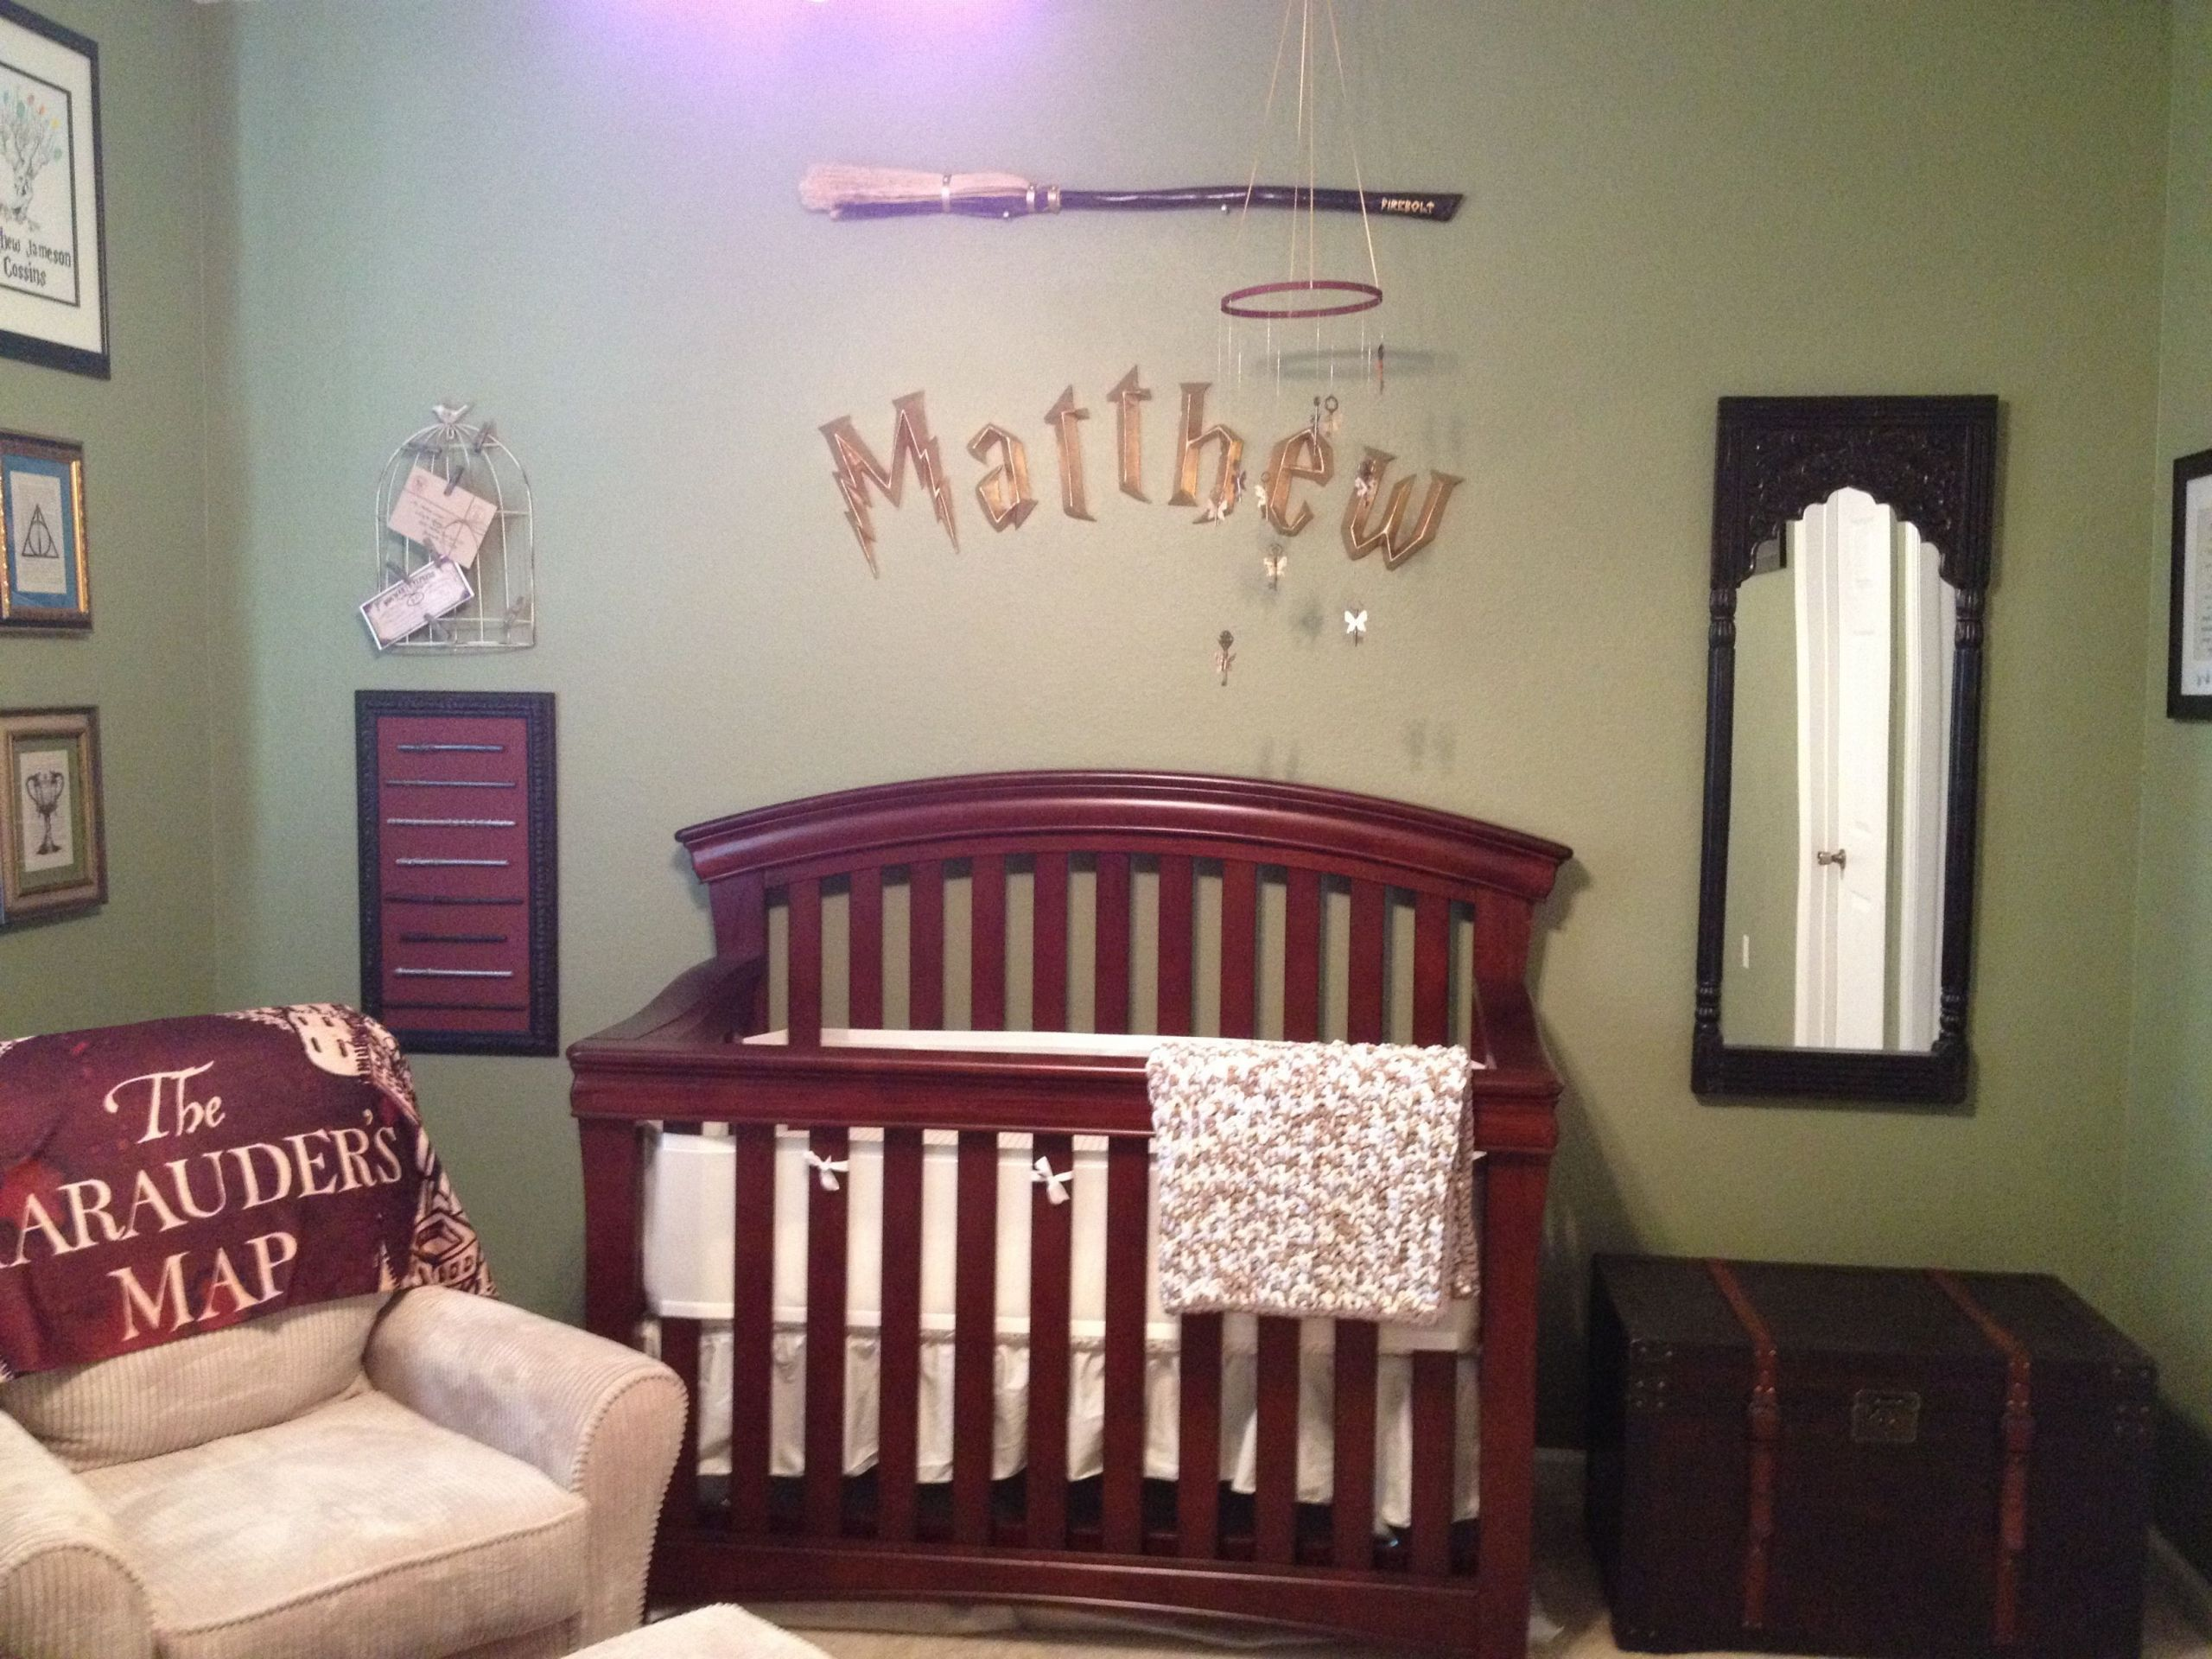 Harry Potter Baby Room Decor  Custom Harry Potter Nursery that I made for my son Matthew